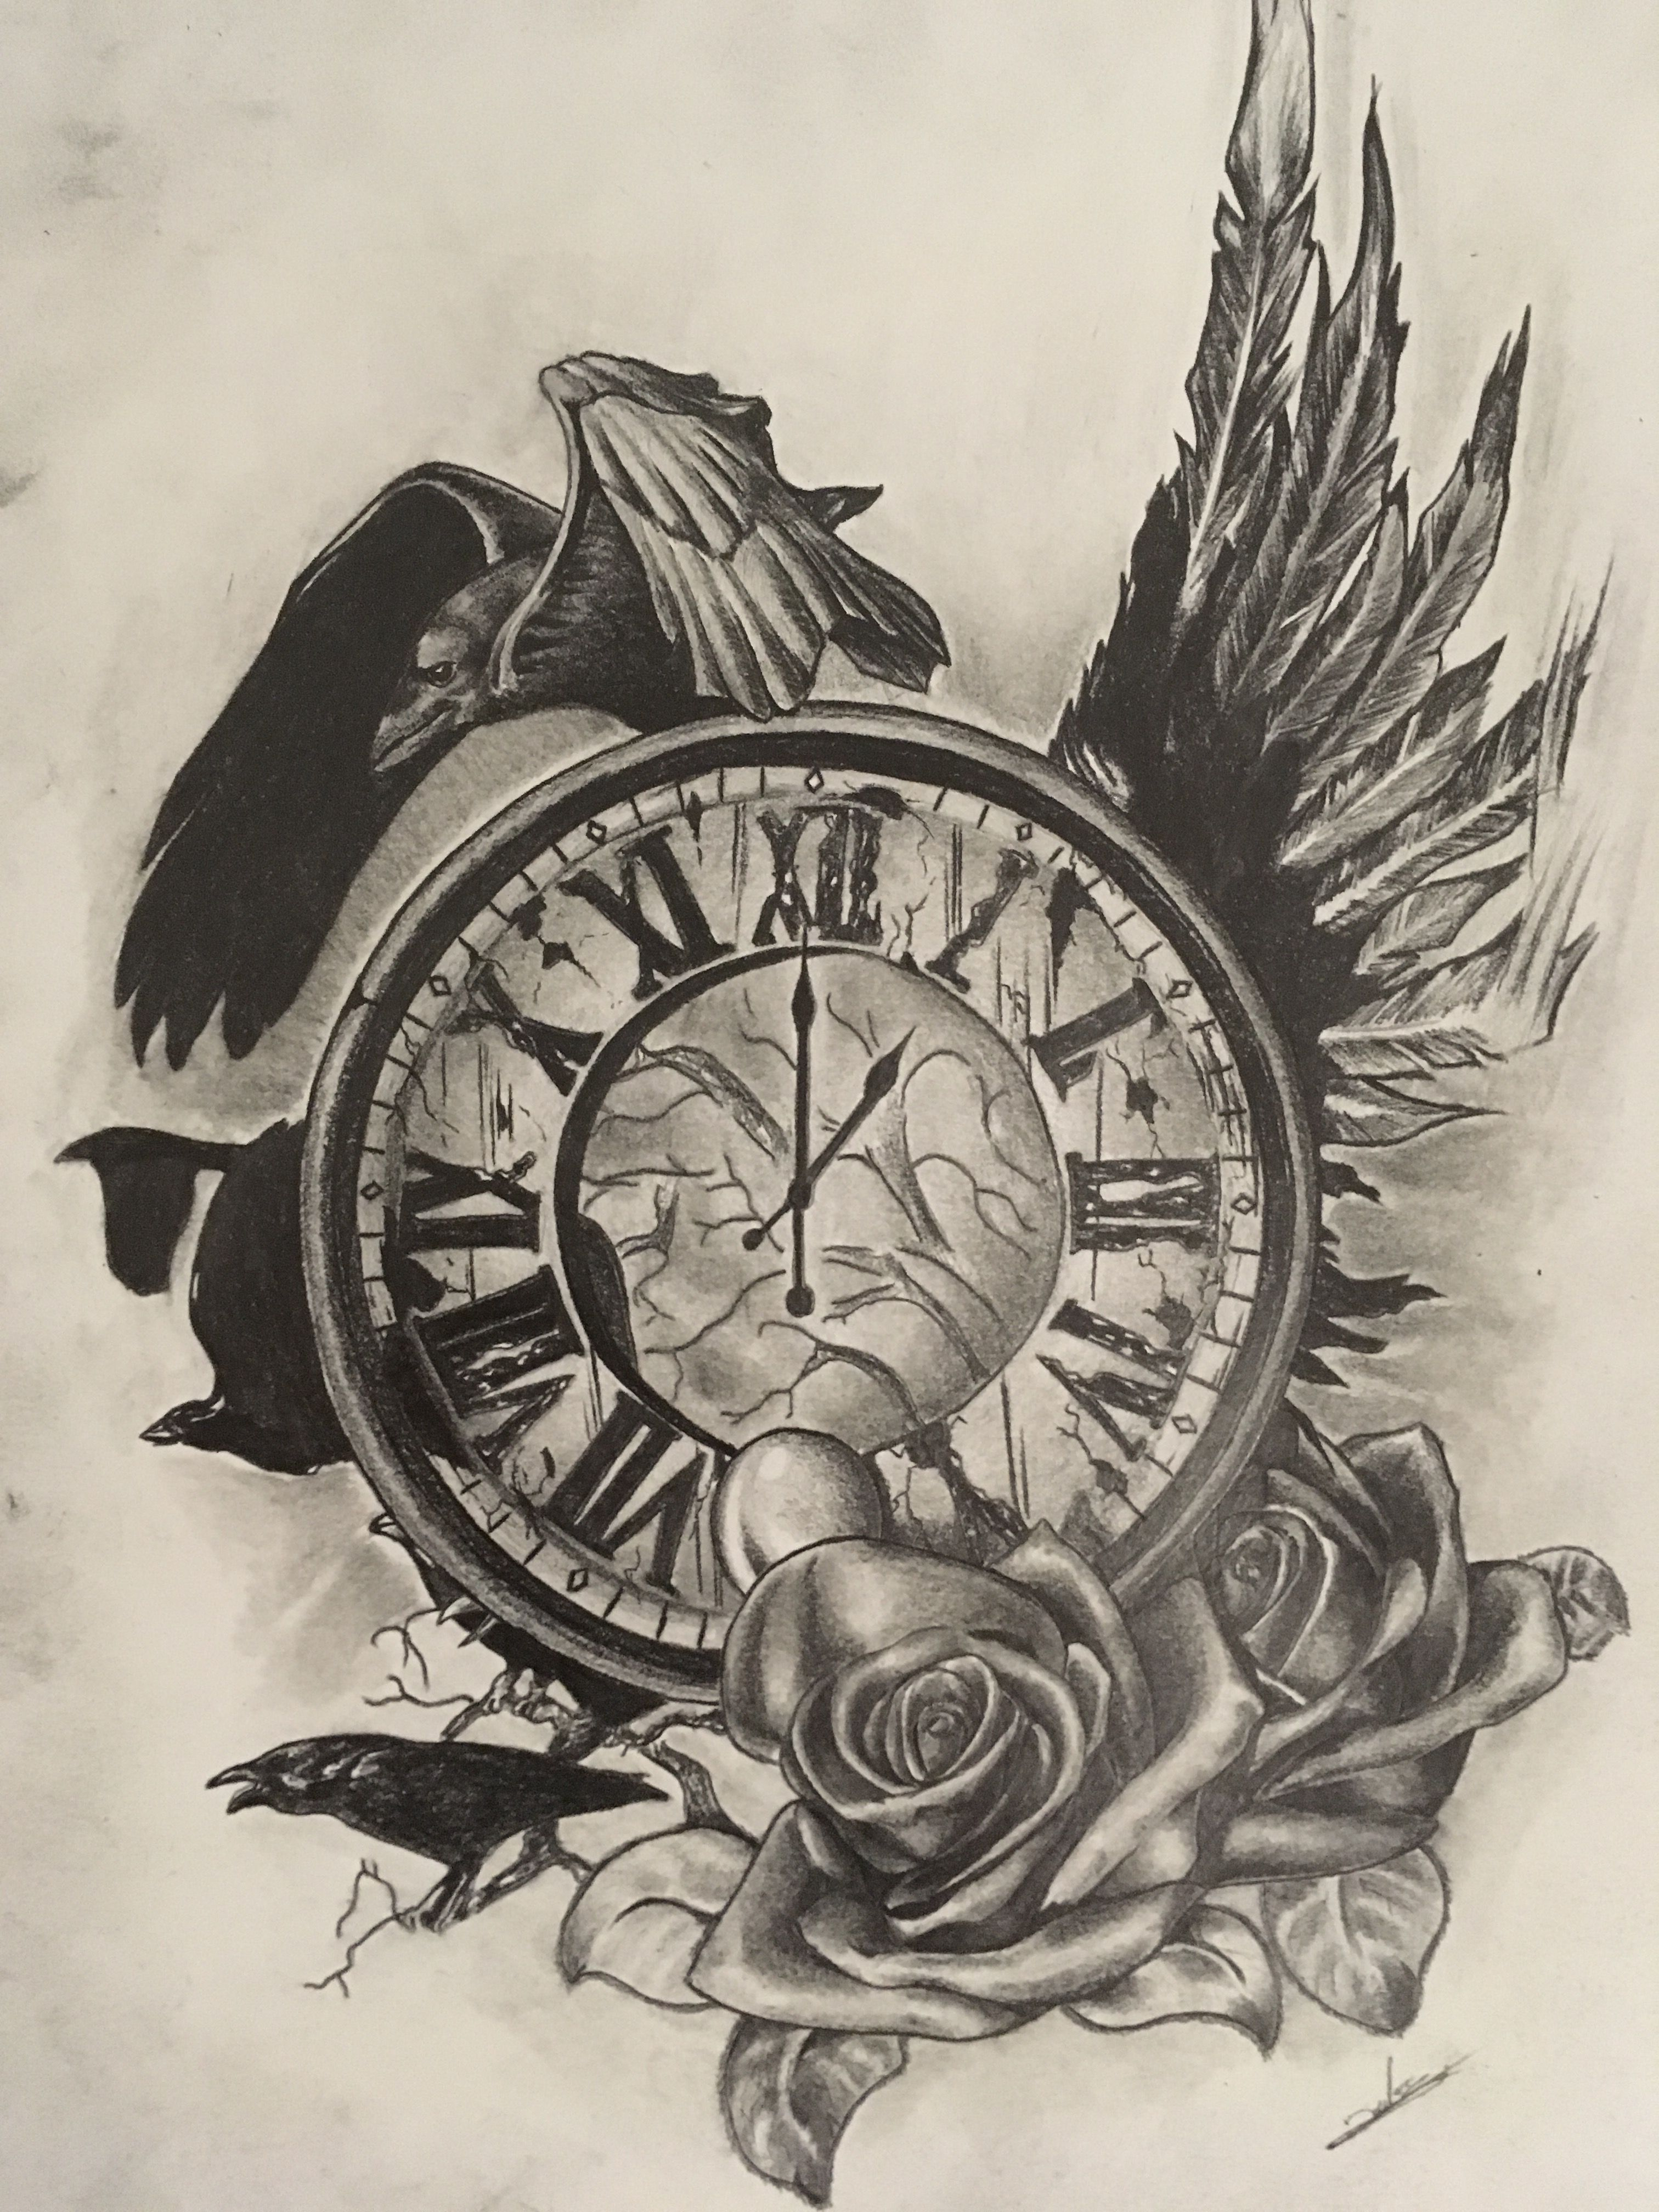 horloge corbeaux tatoo jesus tattoo raven tattoo et time clock tattoo. Black Bedroom Furniture Sets. Home Design Ideas